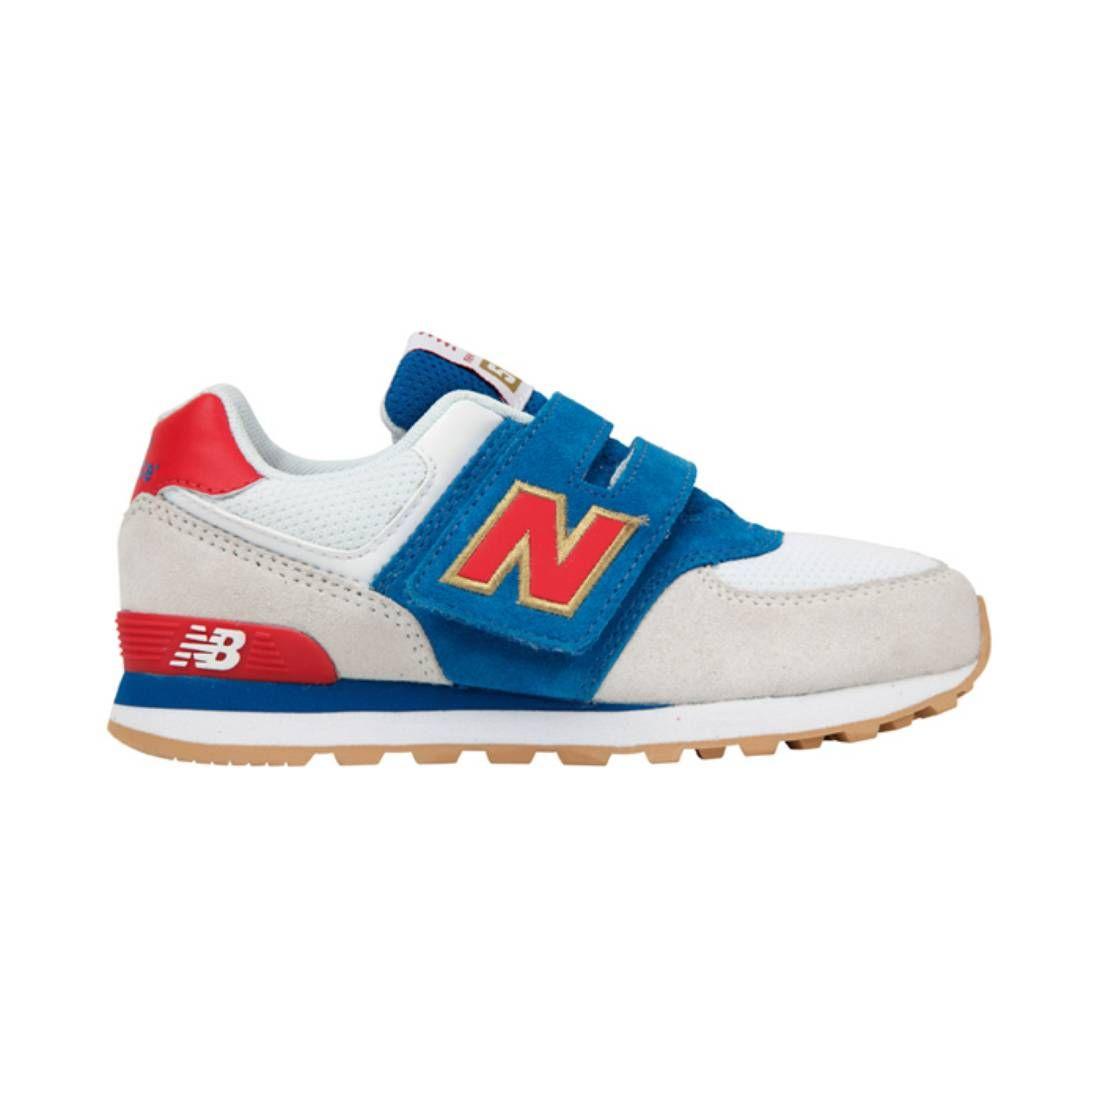 NEW BALANCE Enfant 574 Sneakers | tum|amsterdam BOYS